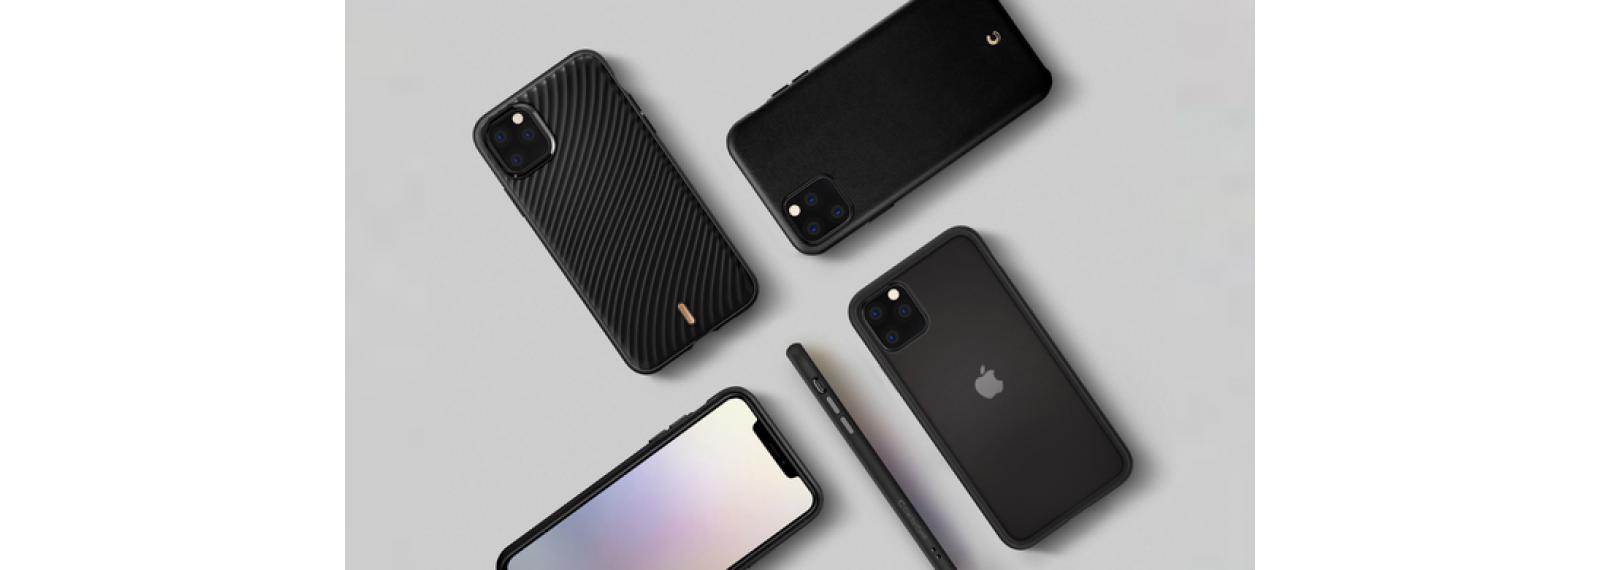 Apple iPhone 11 / 11 Pro / iPhone 11 Pro Max